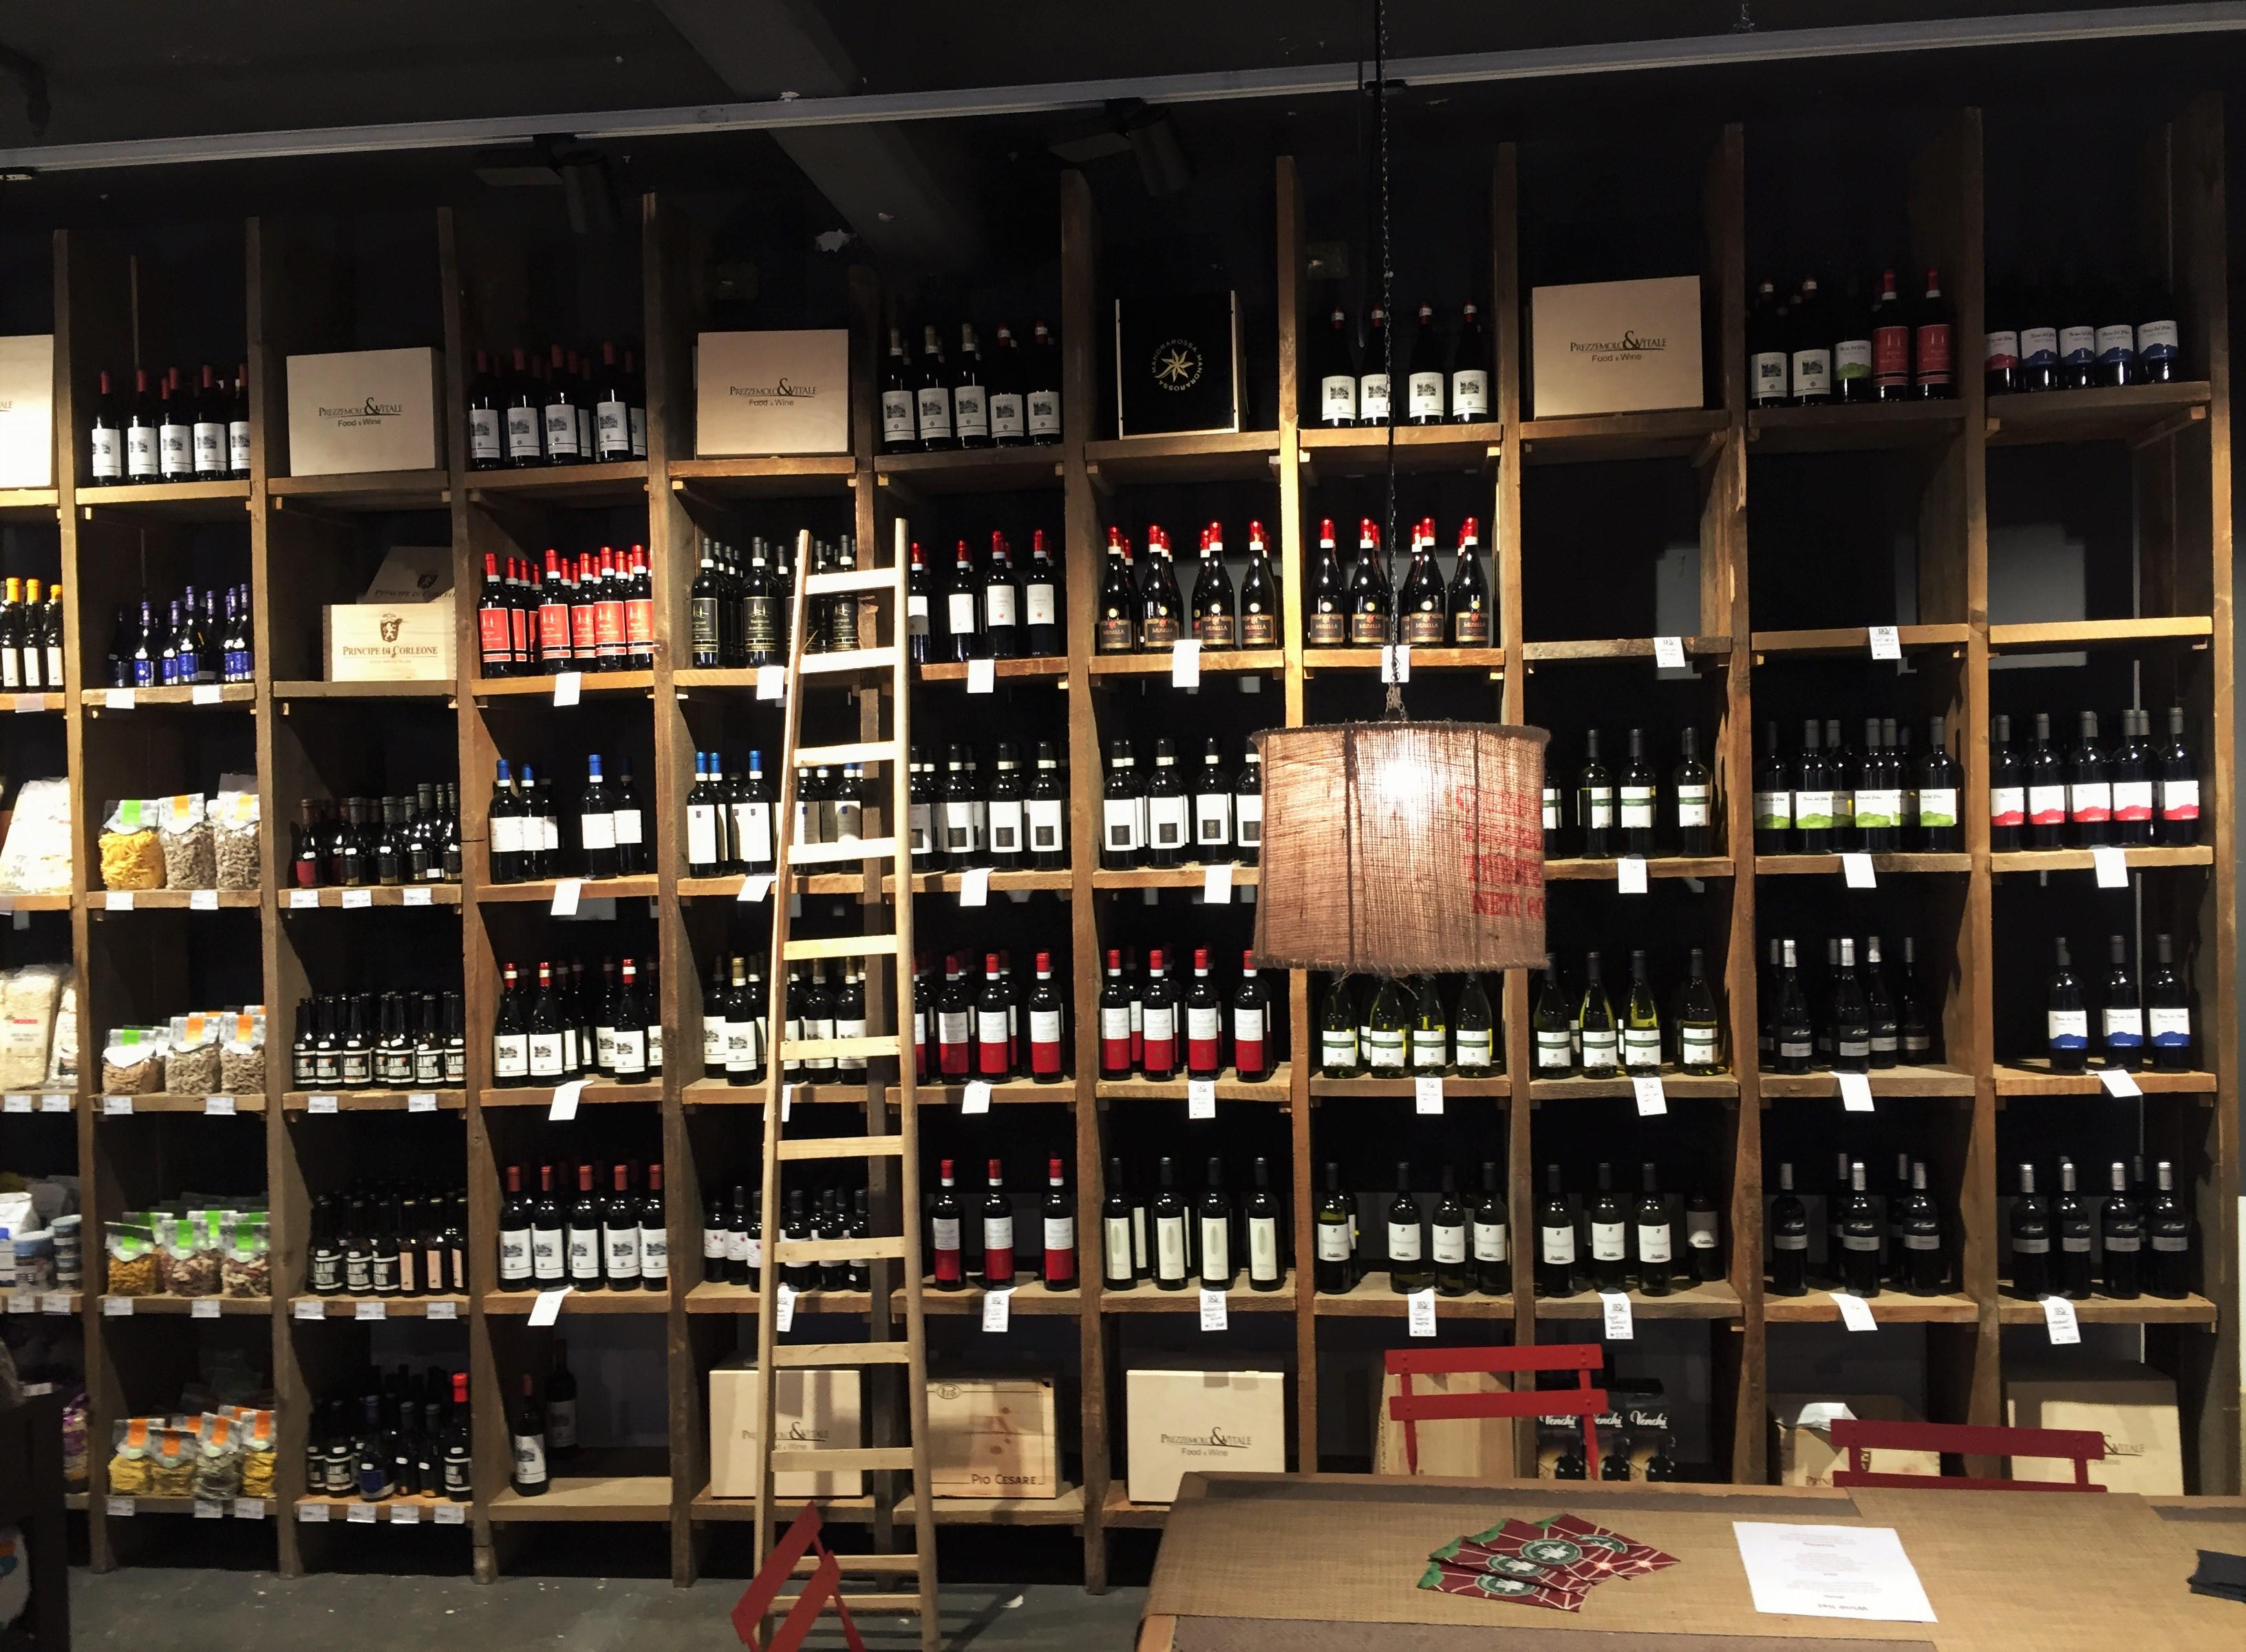 Mercato Metropolitano wines - kenningtonrunoff.com